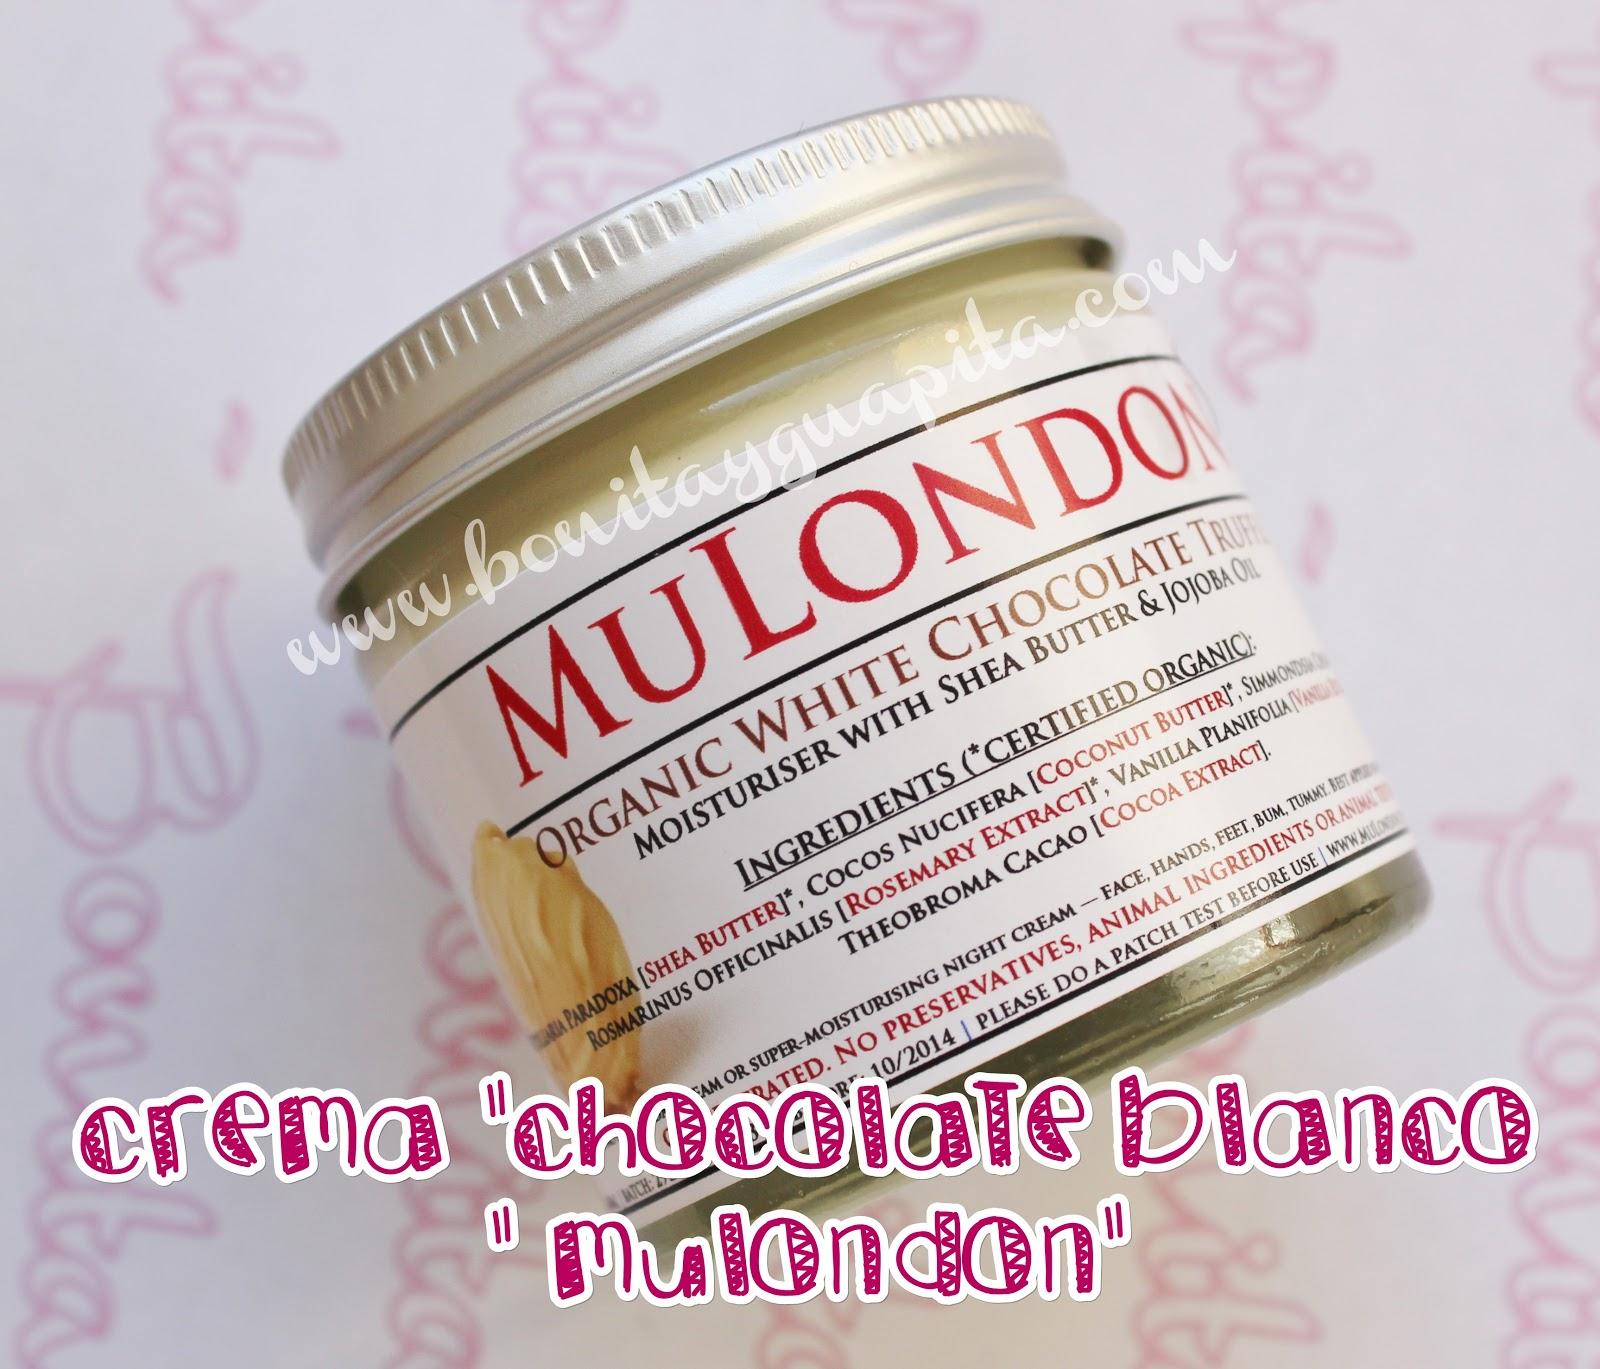 hidratante mulondon